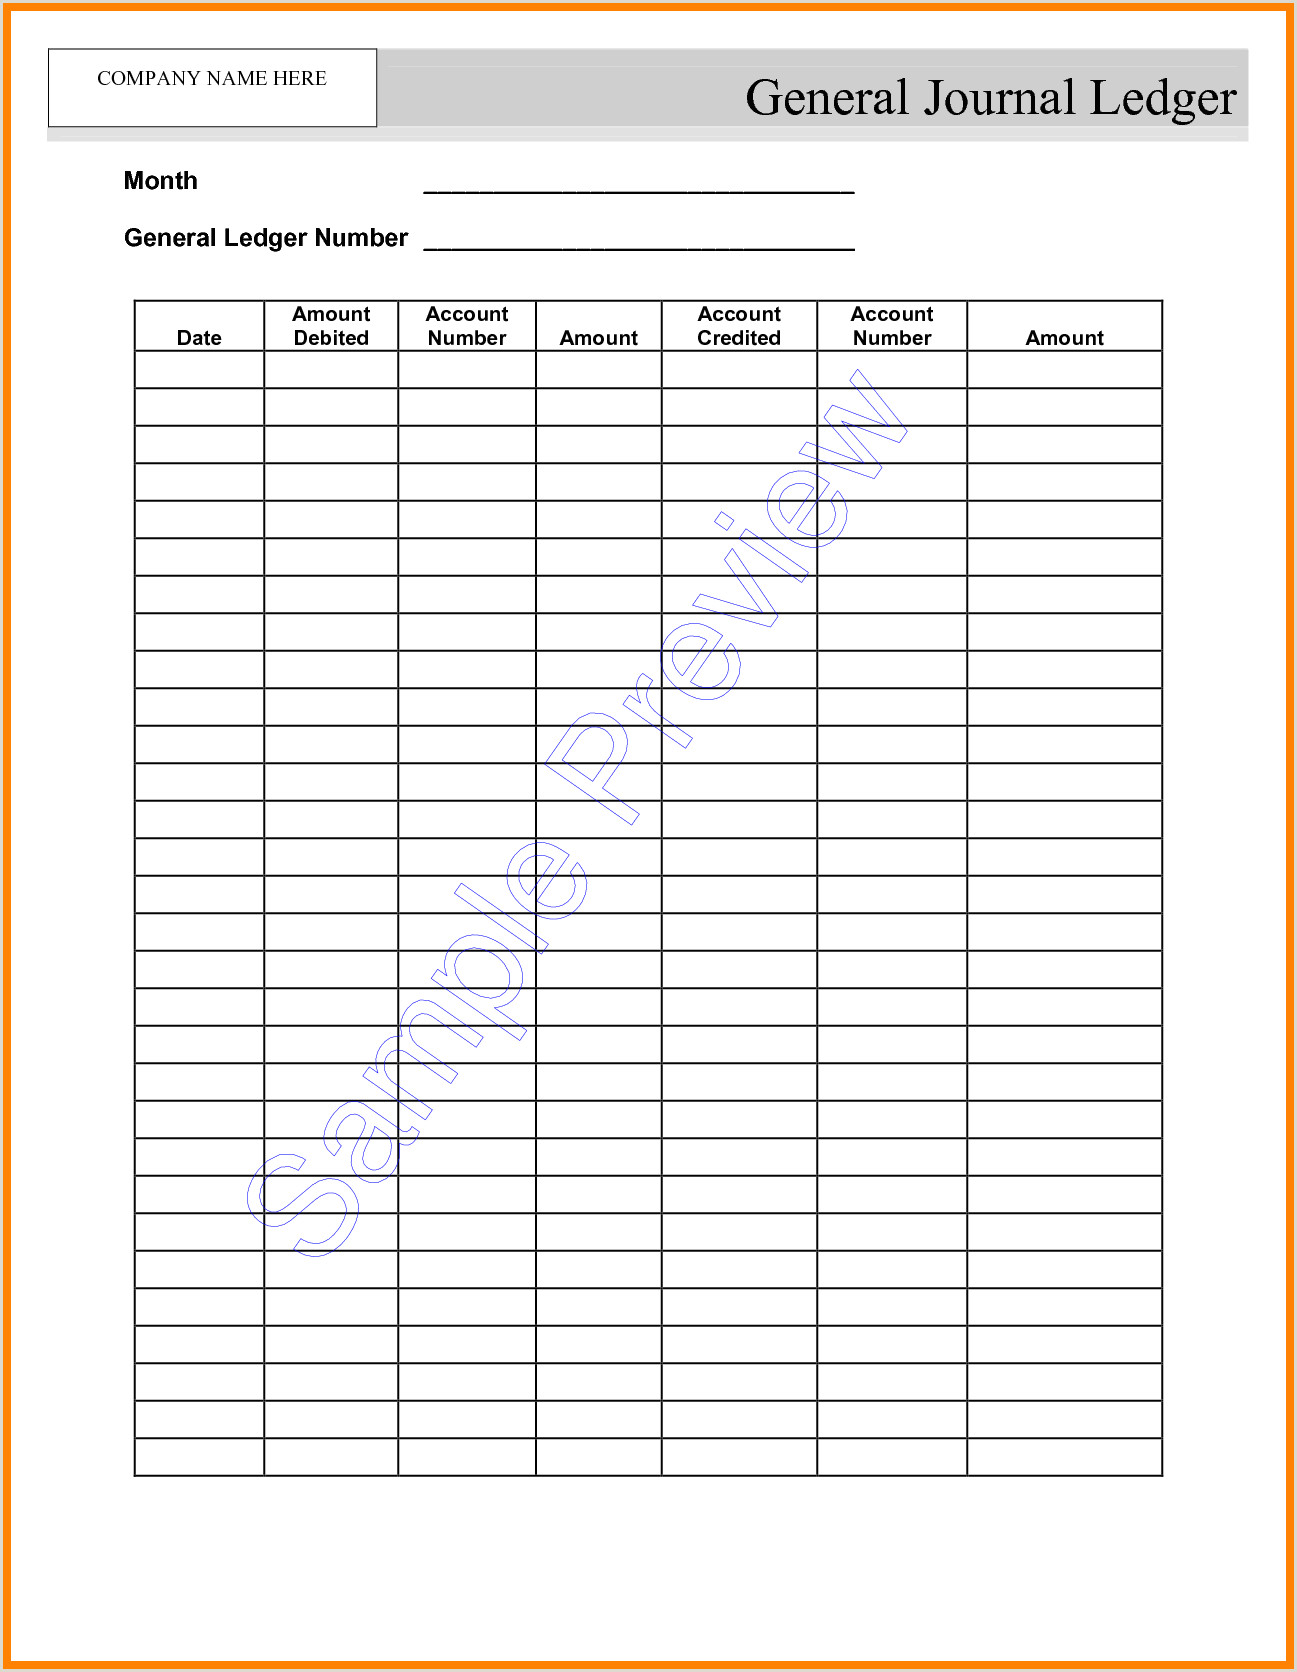 Self employment ledger template excel hpcr